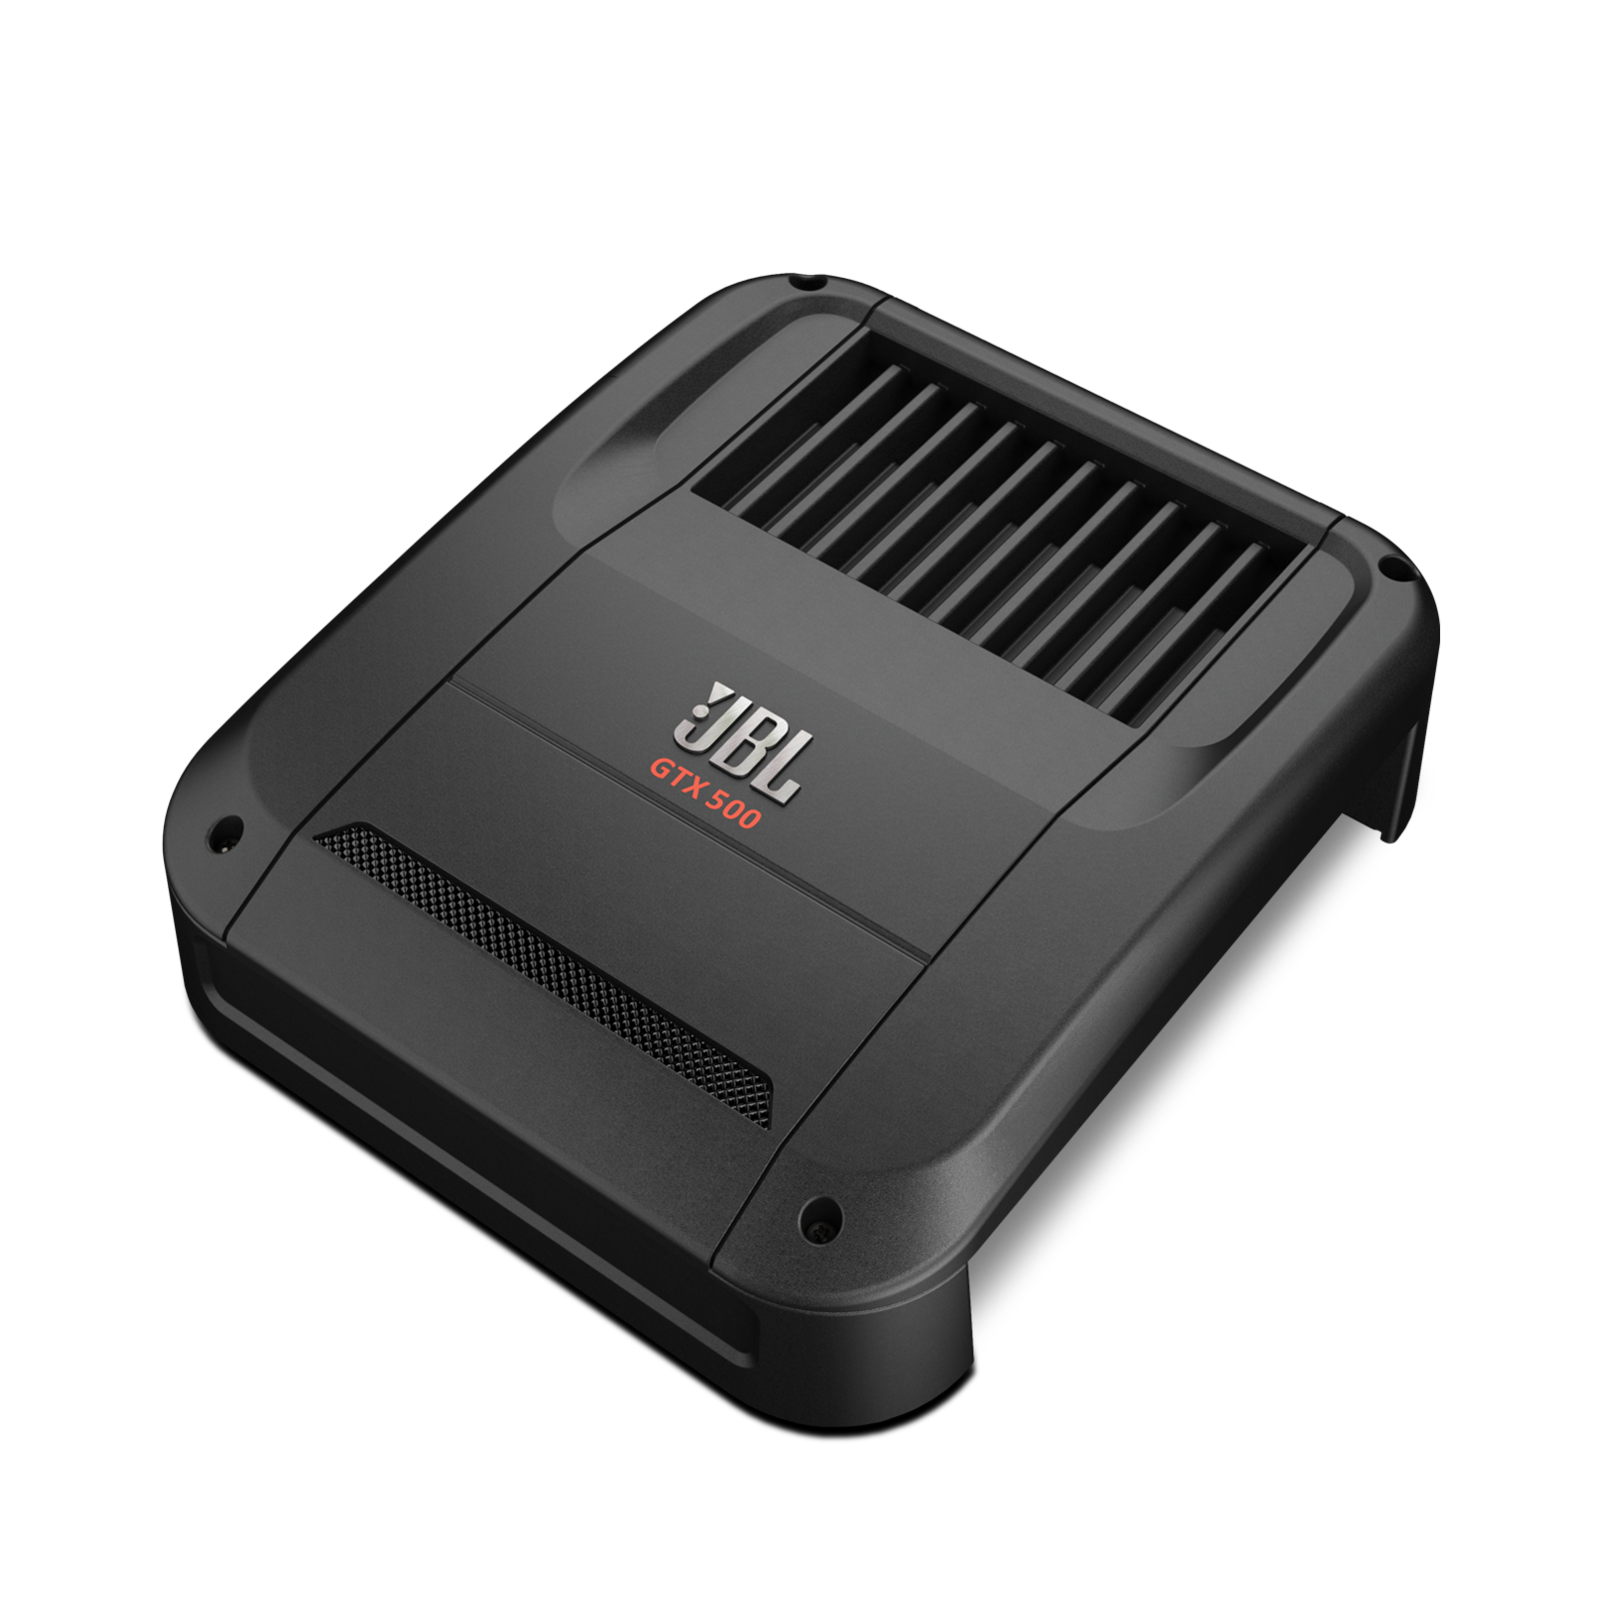 JBL GTX 500 (Recertified) 750 Watt Compact Car Subwoofer Amplifier $90 + Free Shipping!